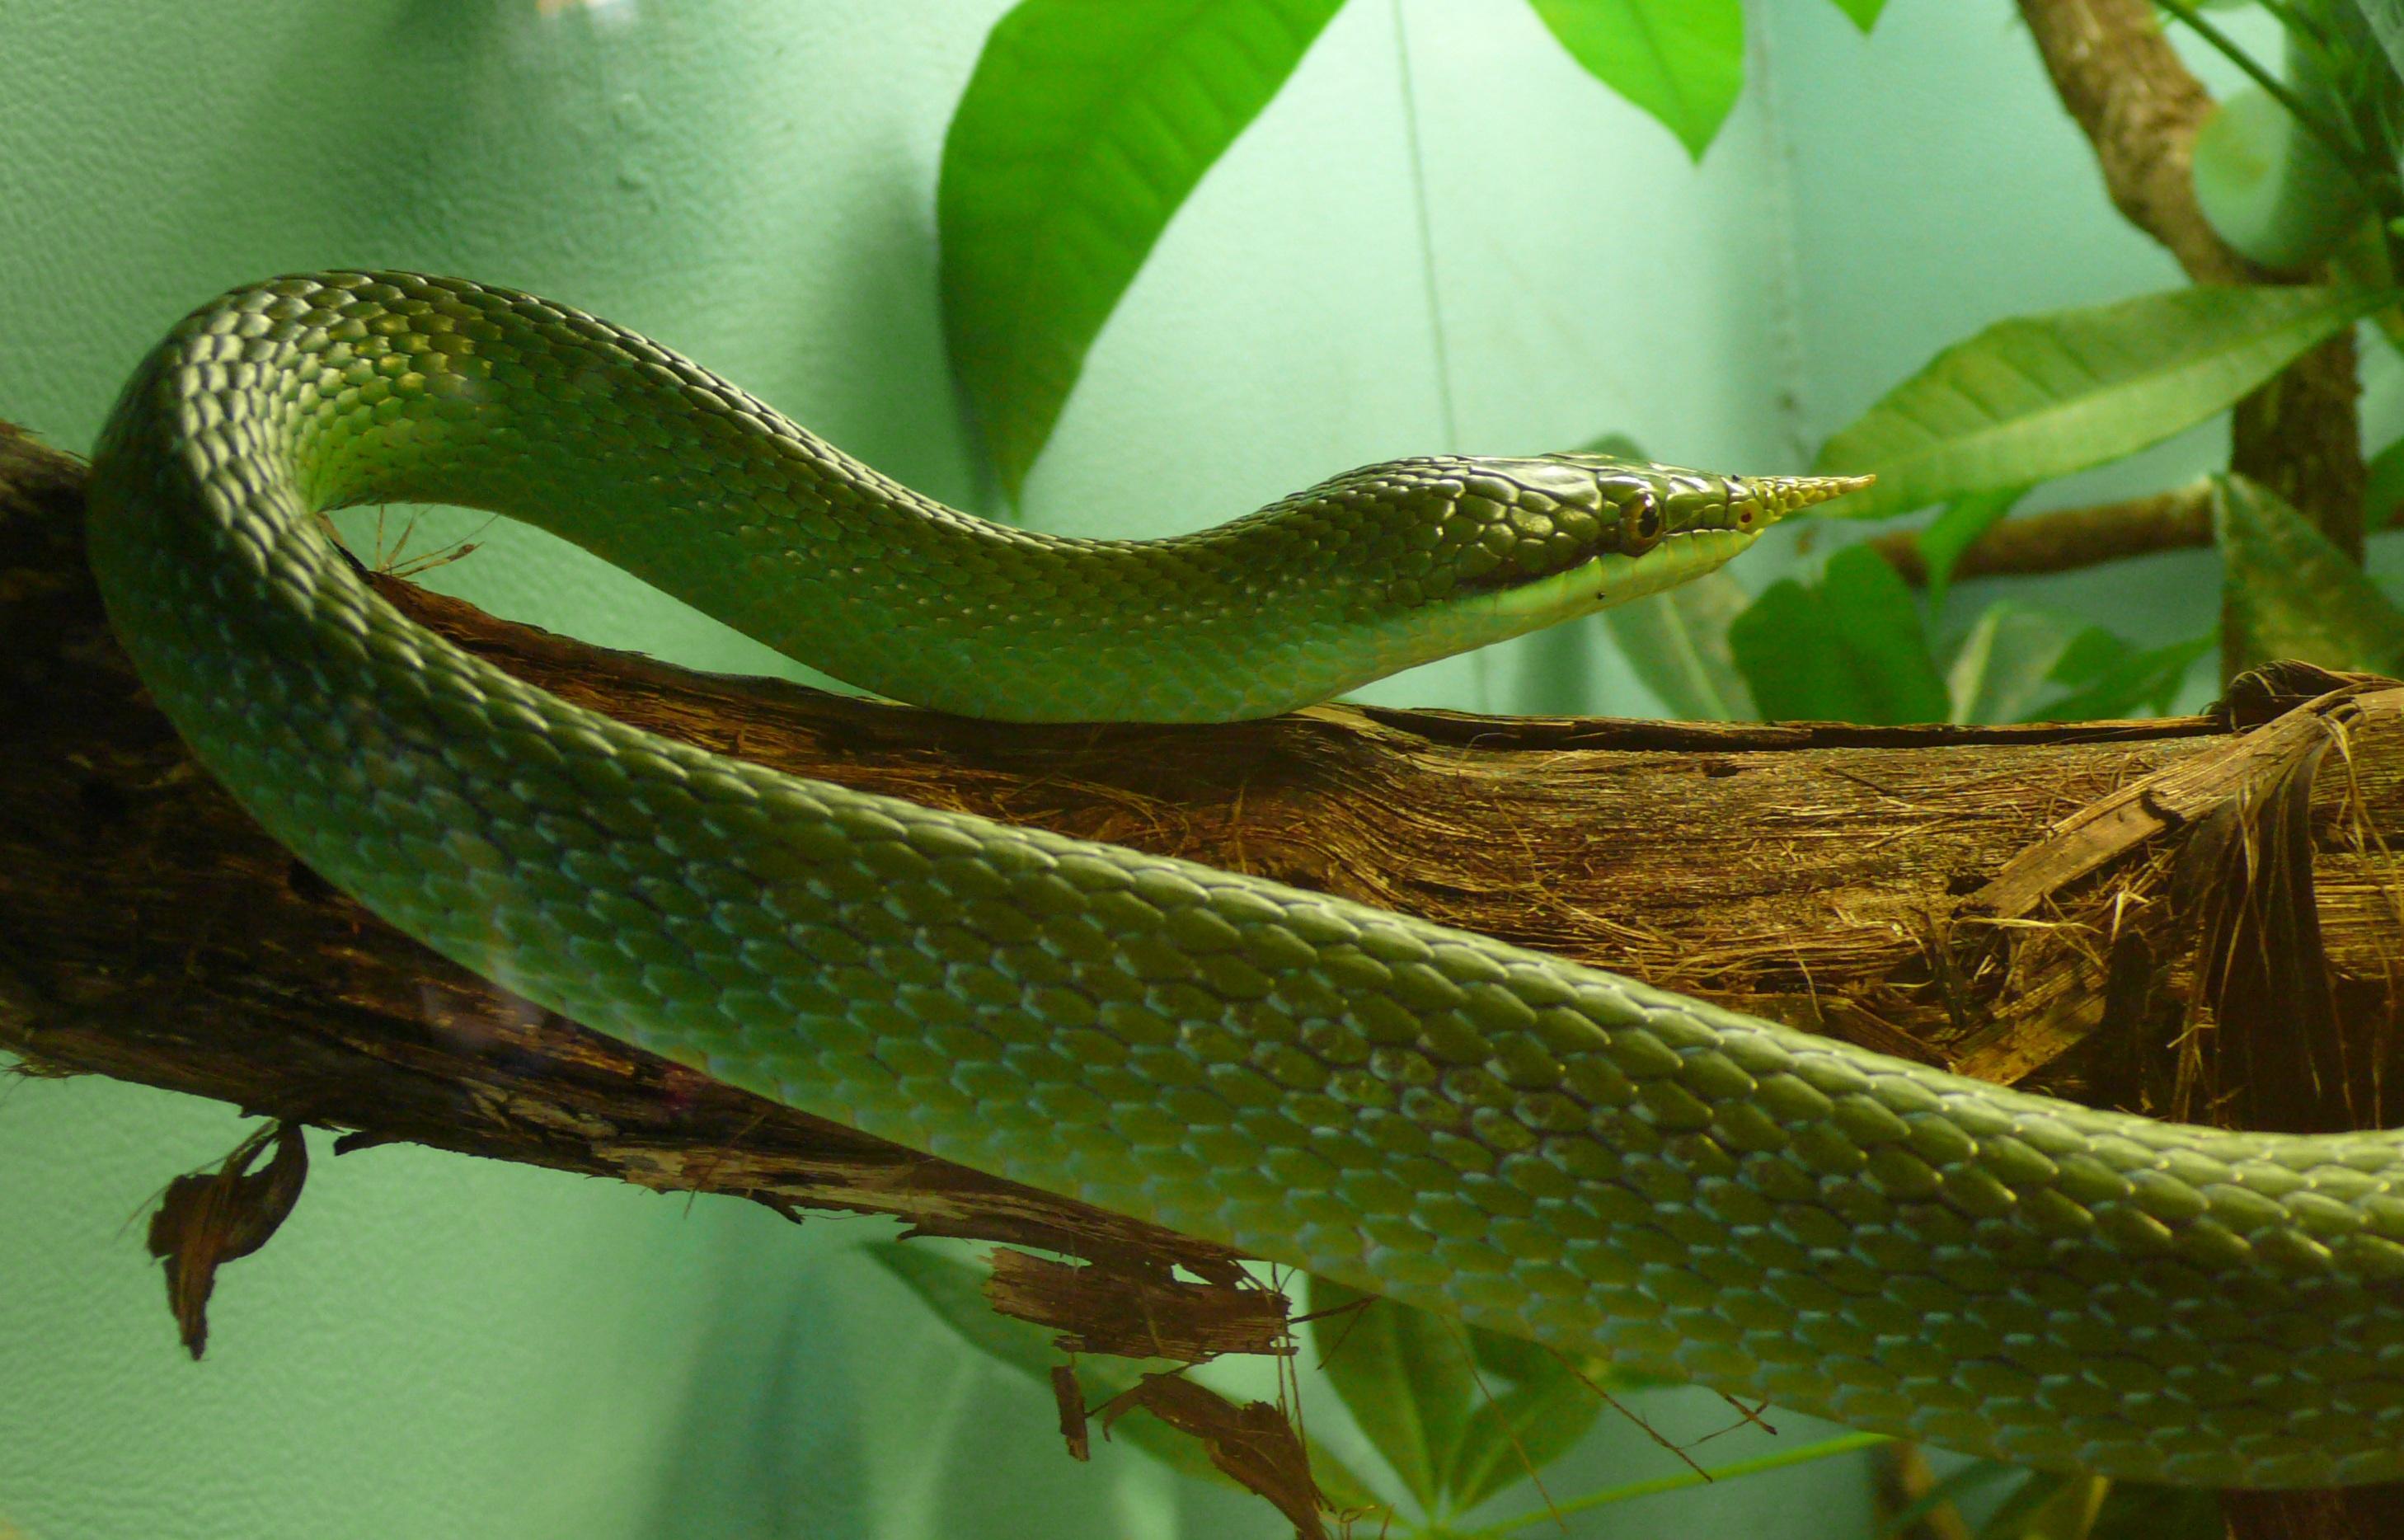 Snake on the tree photo